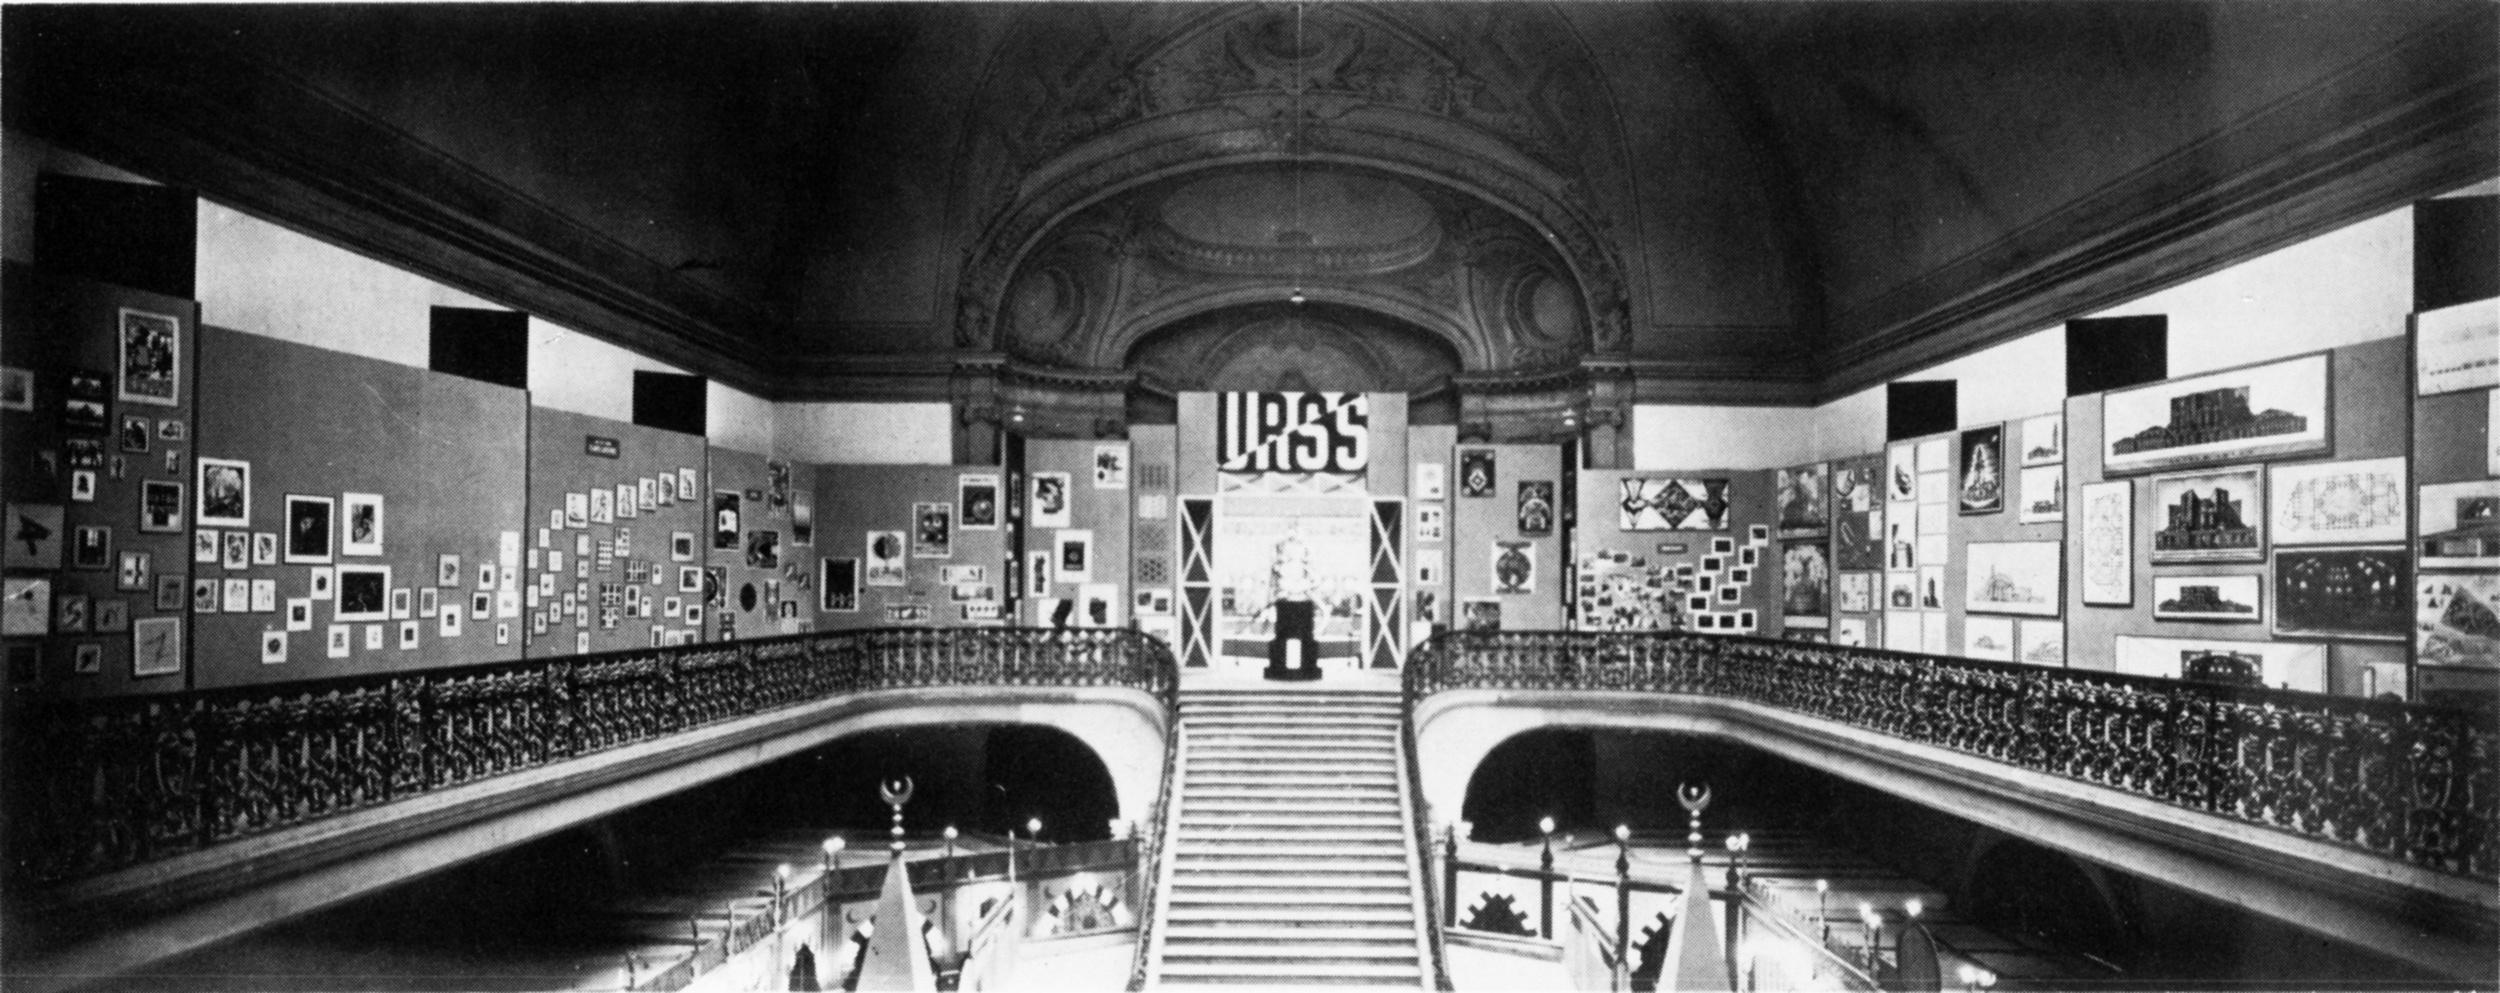 The Soviet Pavilion in Paris (1925)